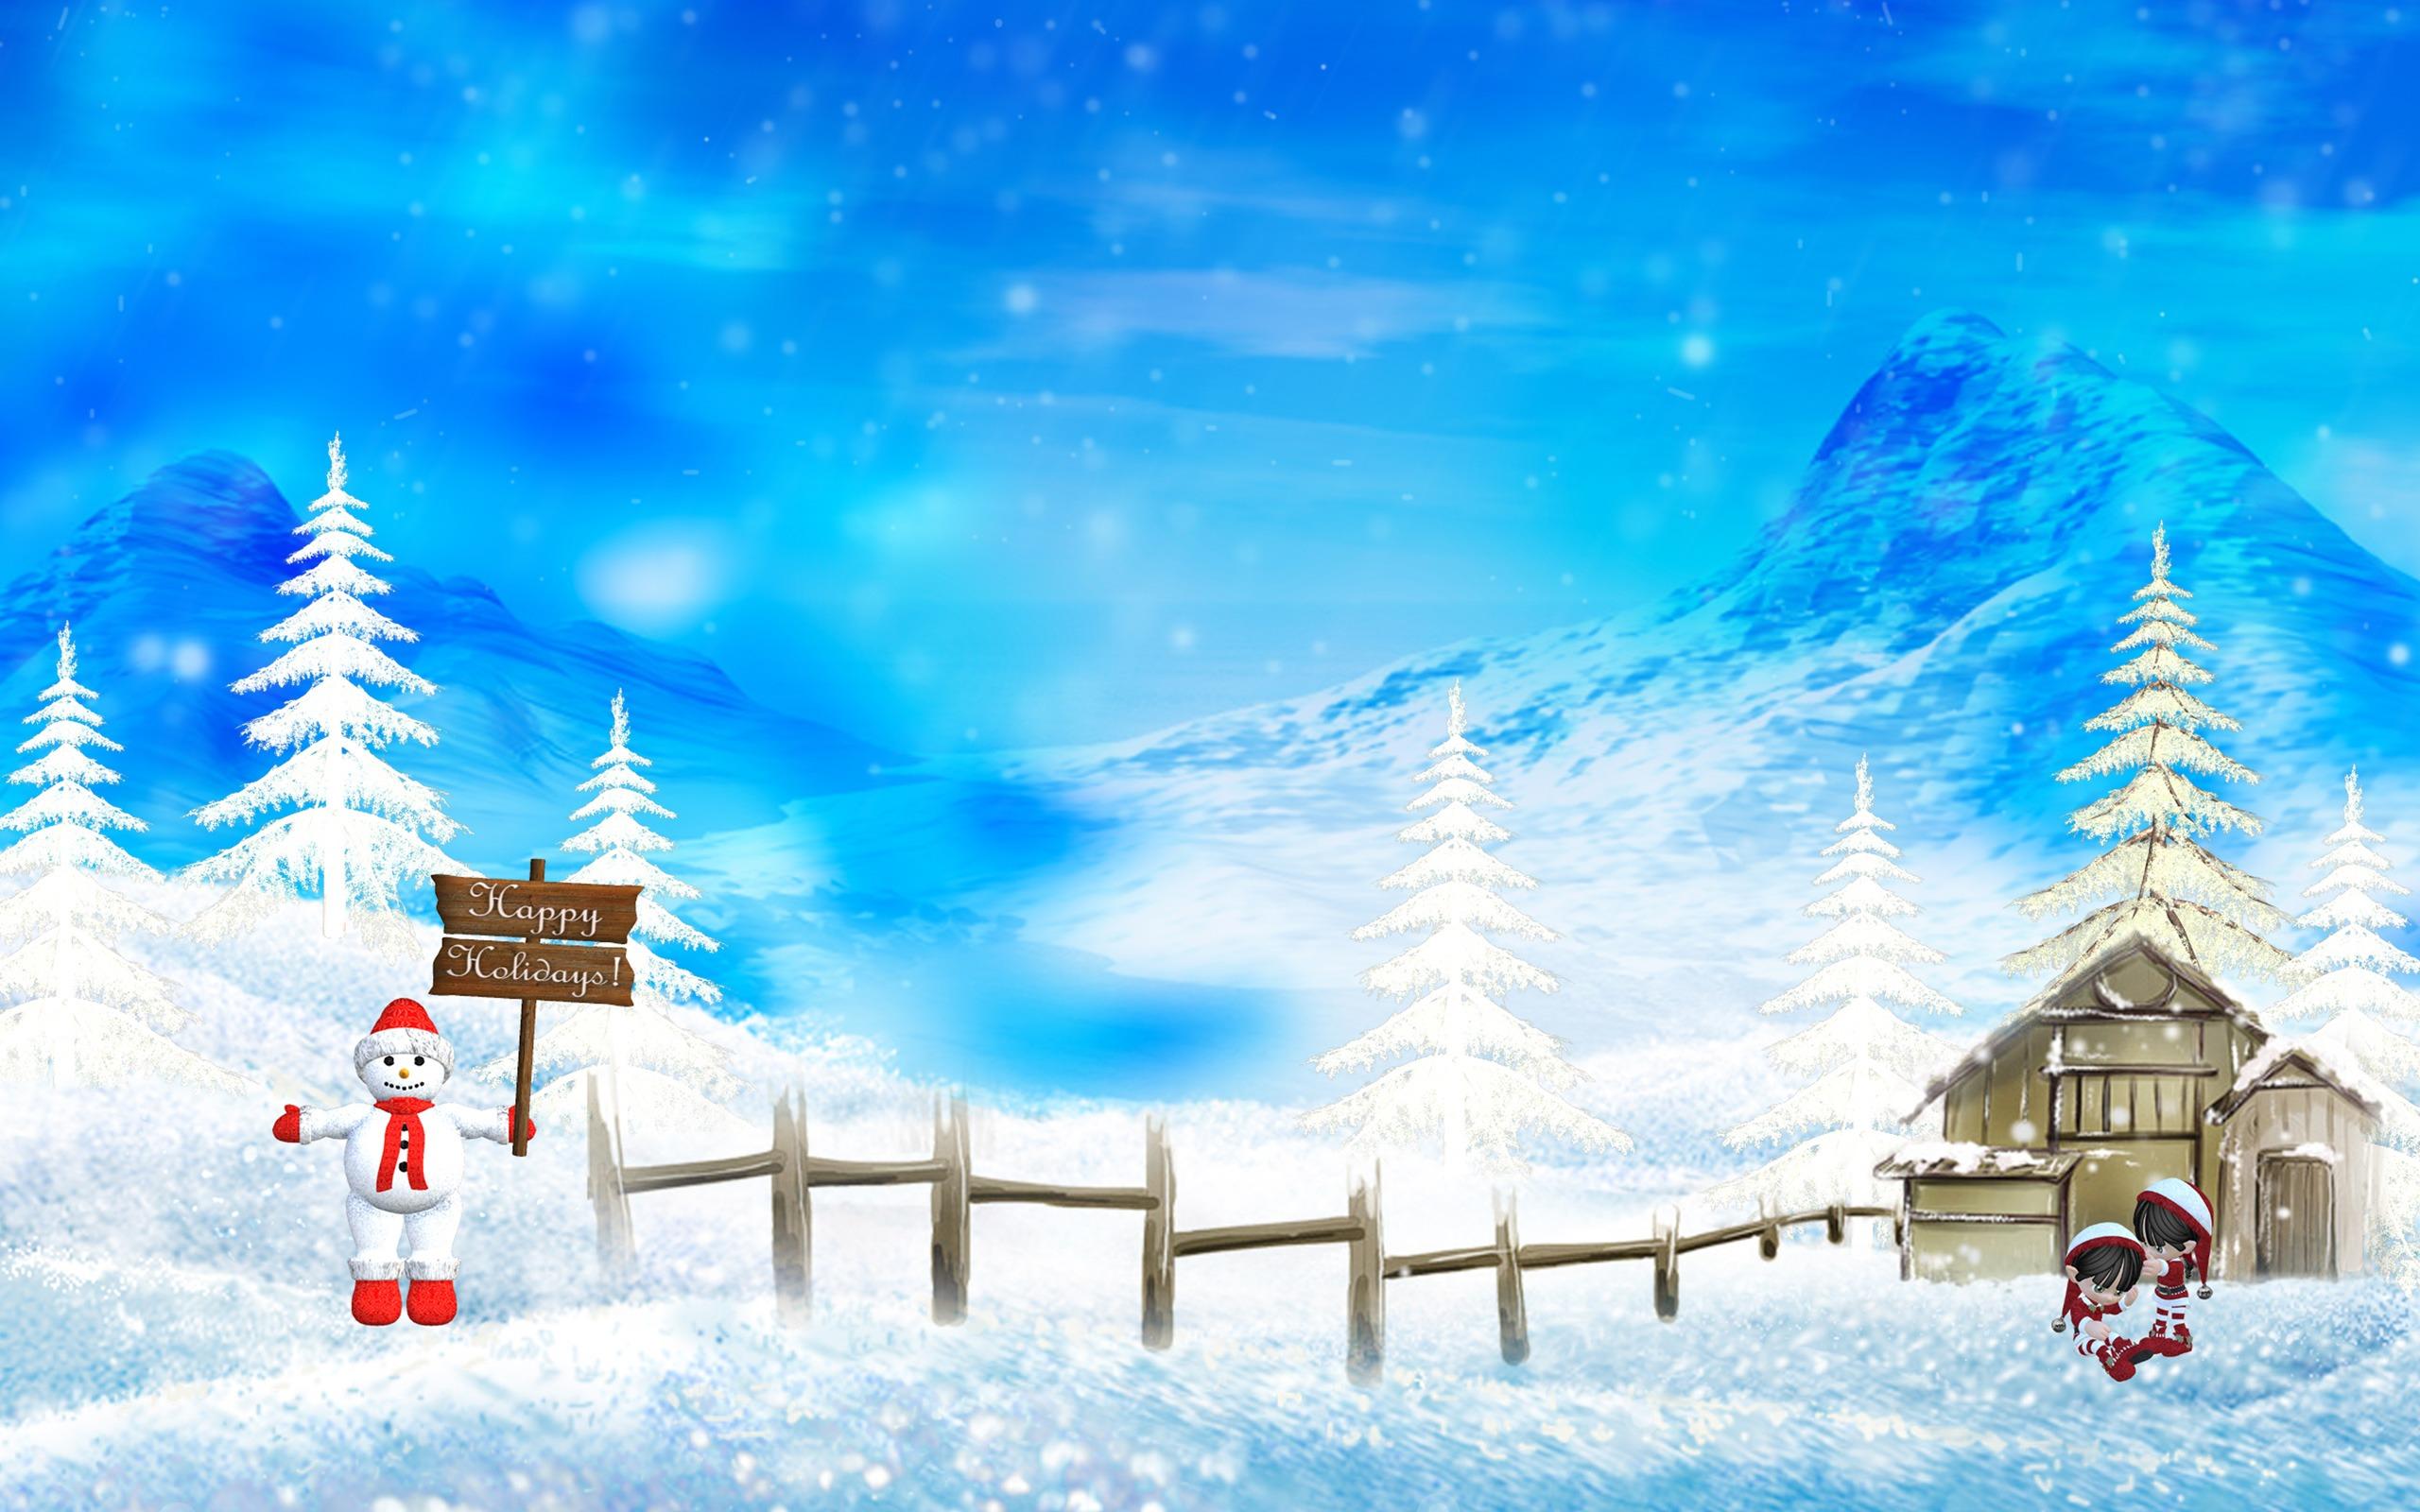 Free Xmas Wallpapers Animated Happy Hollidays Wallpaper Christmas Holidays Wallpapers In